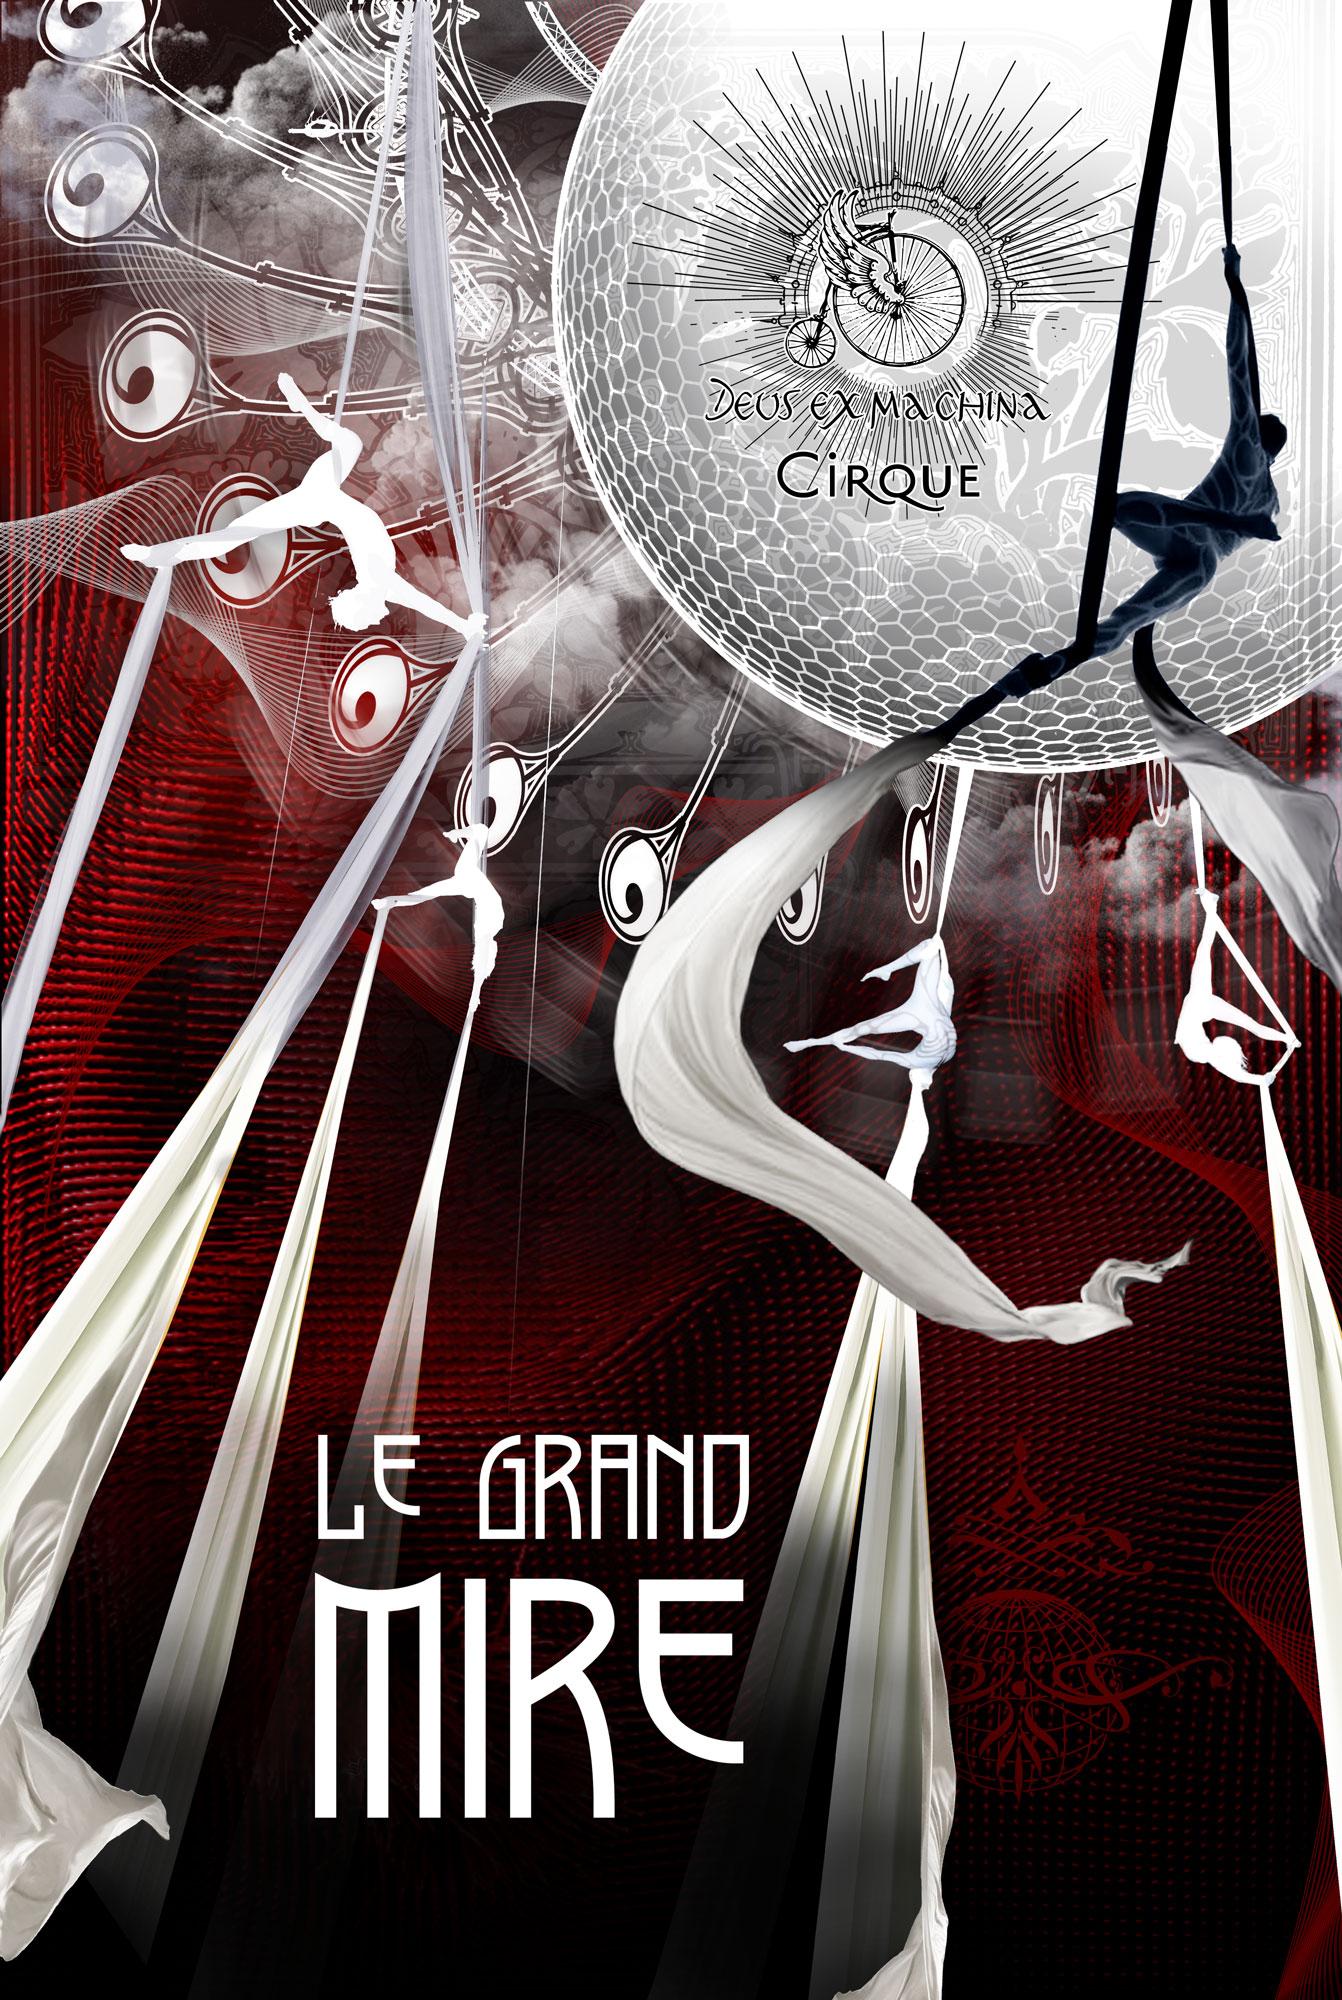 Through the Looking-Glass | Compagnie Deus ex machina cirque